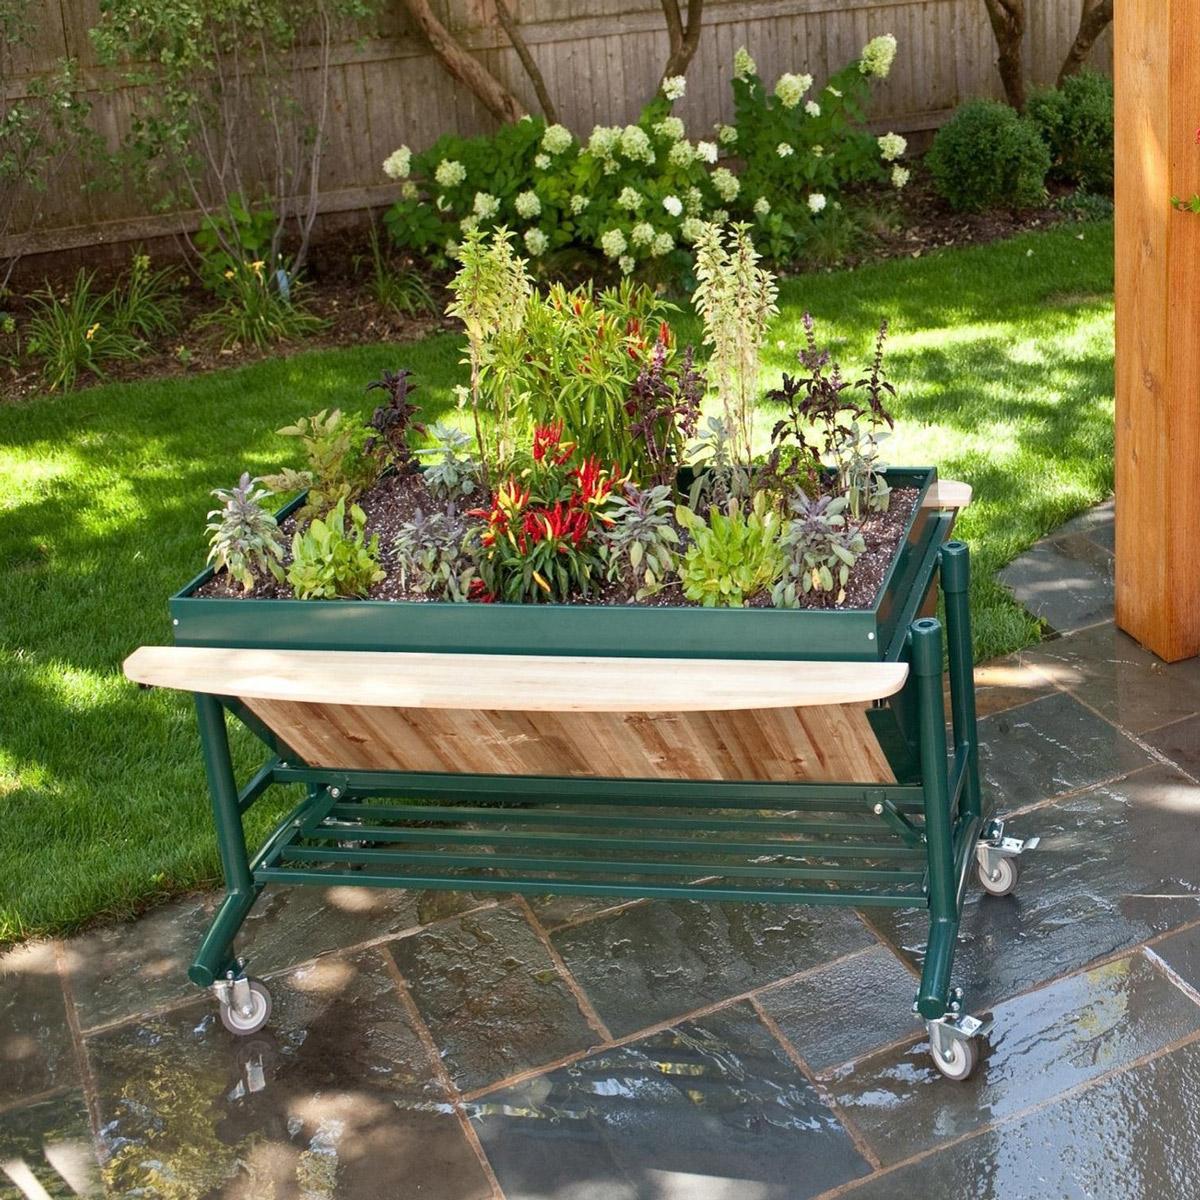 LGarden   Elevated Gardening System